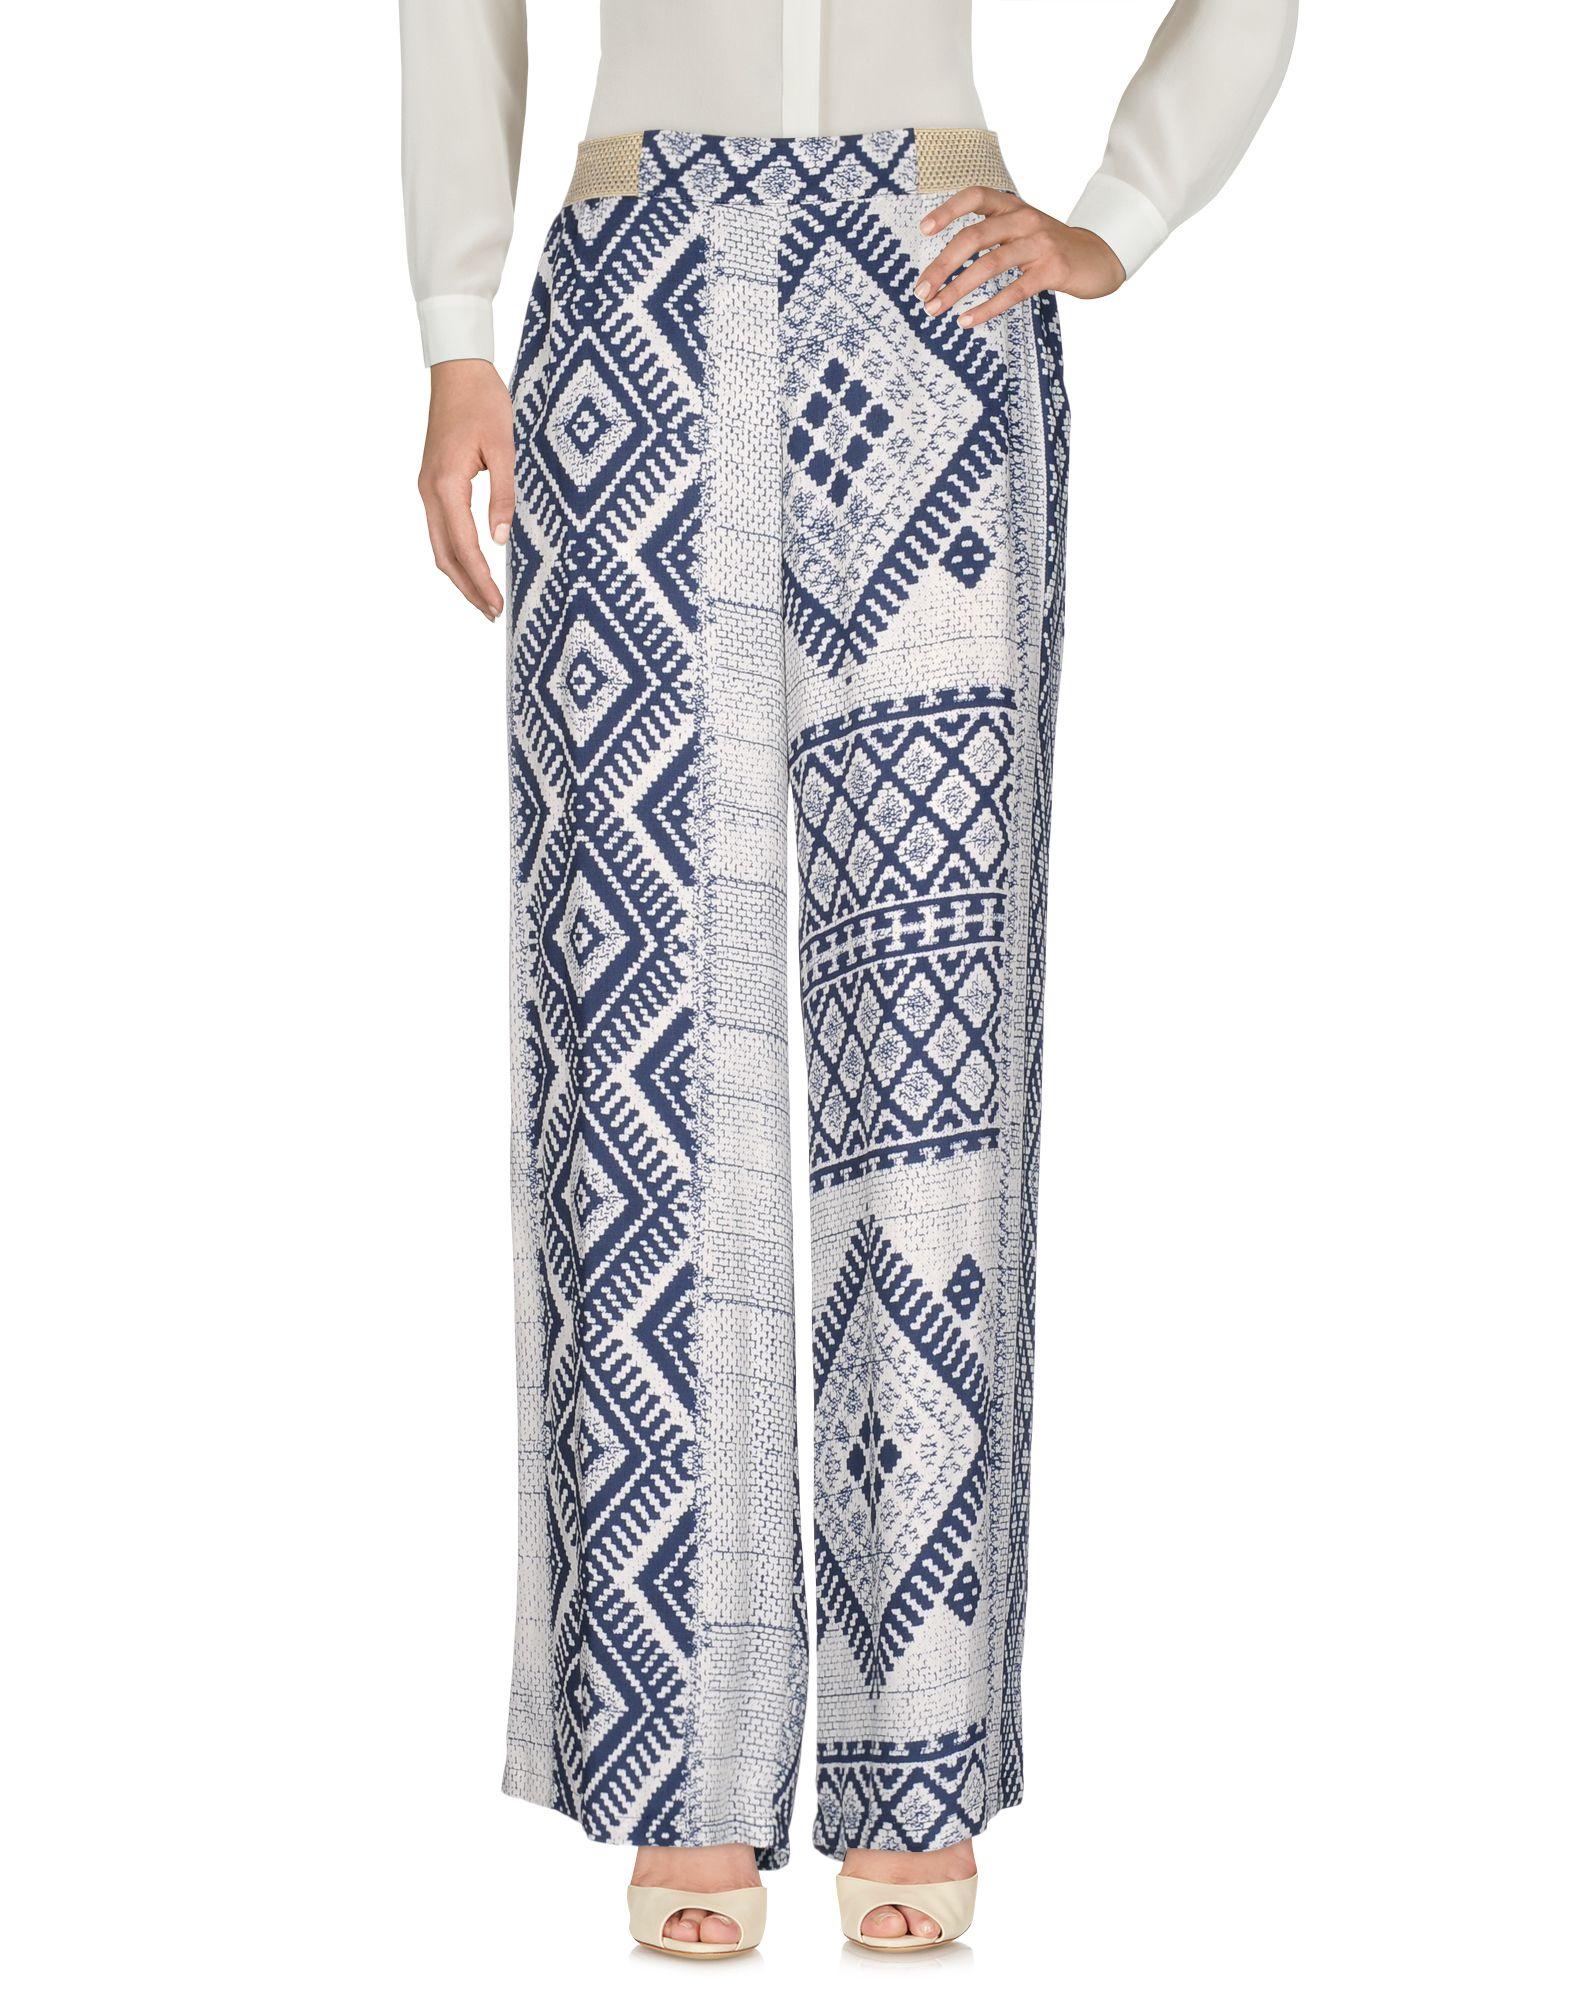 Pantalone Holy Ghost Donna - Acquista online su INcVf8hxTR